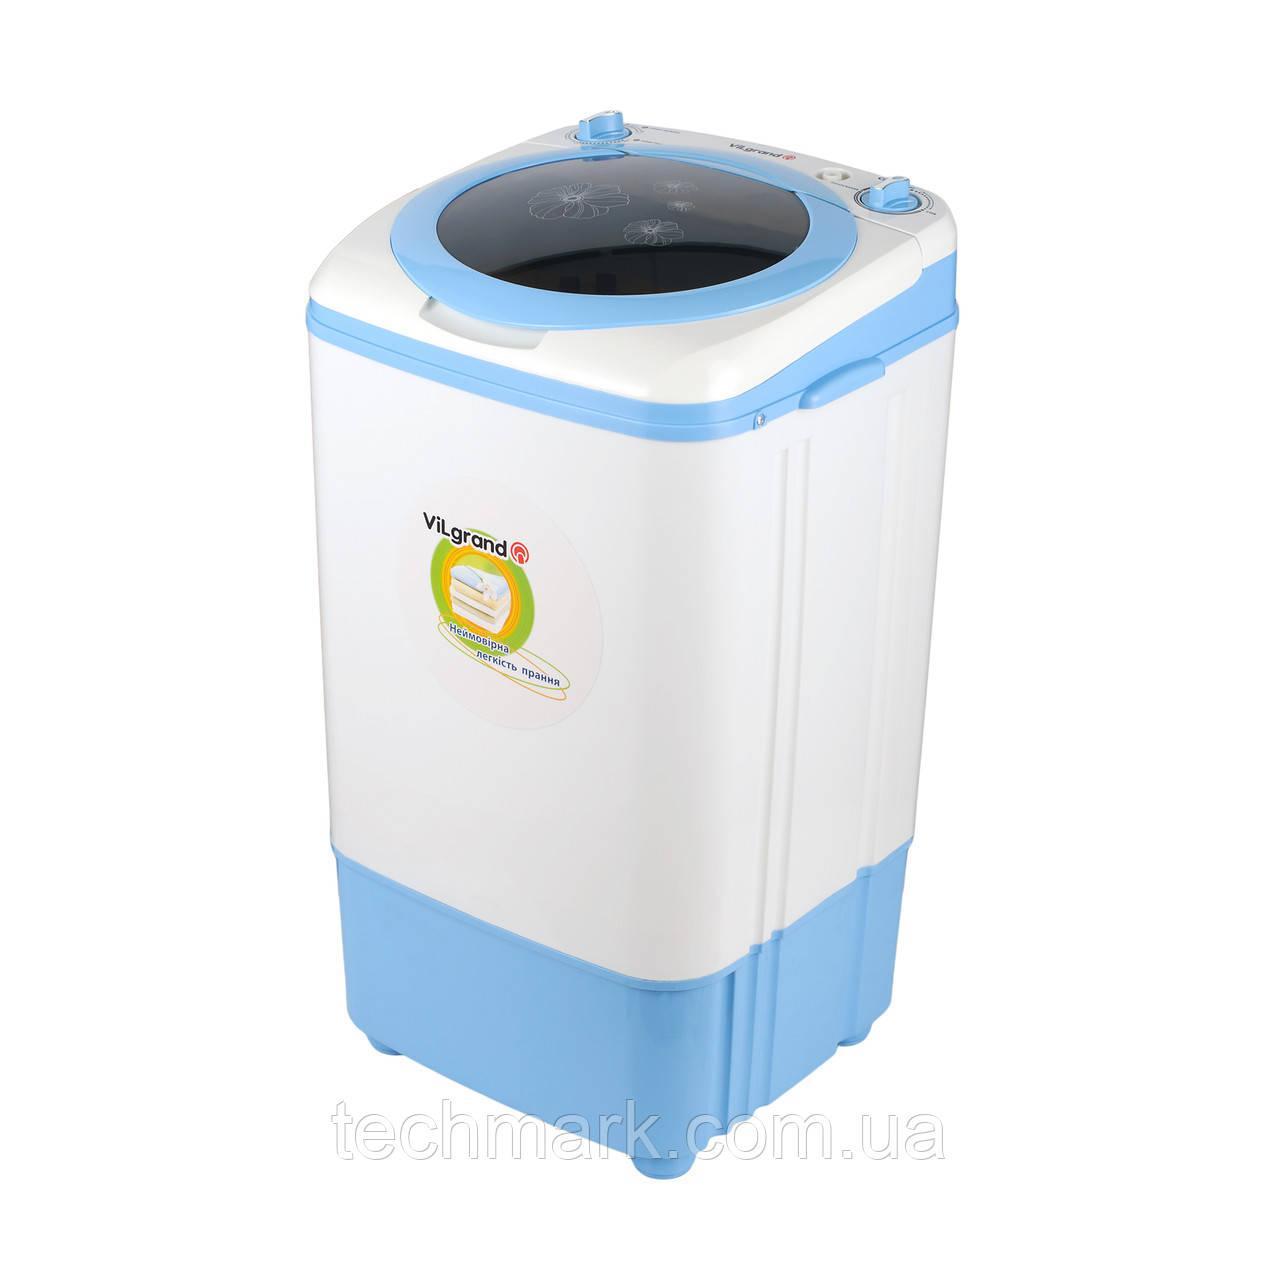 Стиральная машина полуавтомат VILGRAND V701S белая с голубым (7 кг,съемная центрифуга)